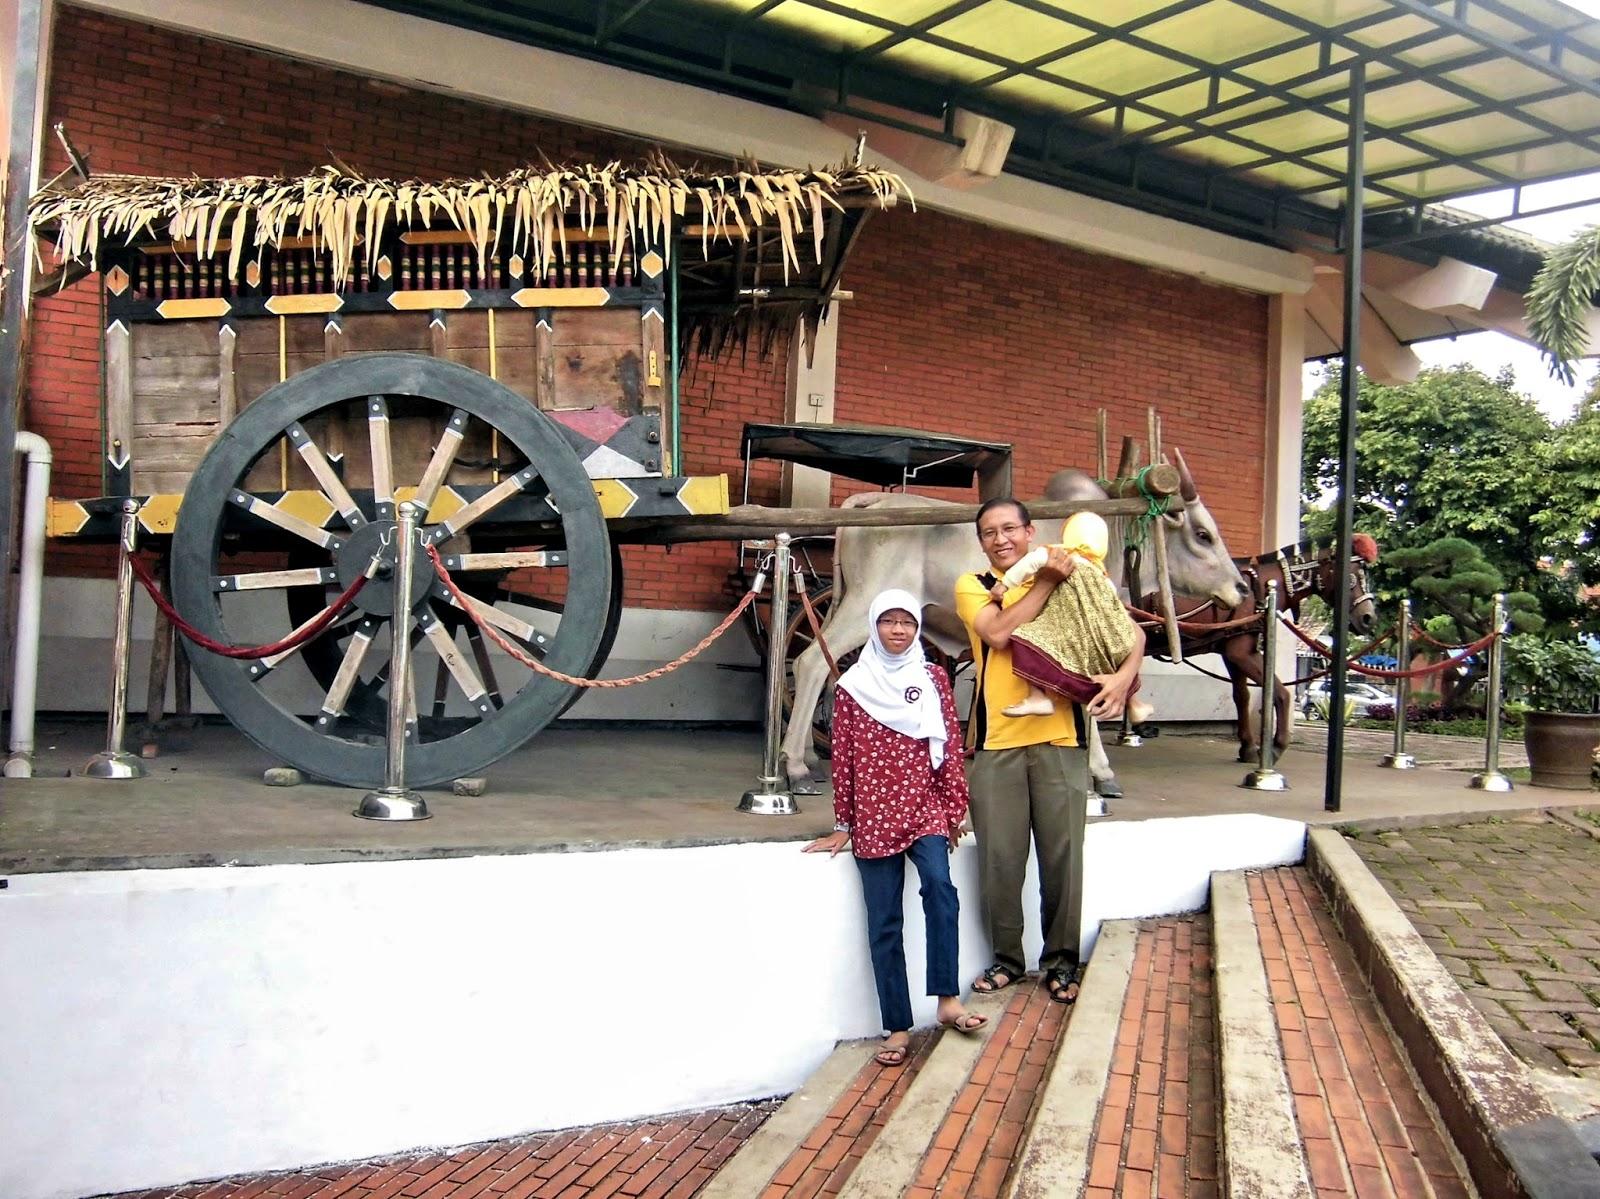 Firdaus Ubaidillah 2013 Rekreasi Museum Negeri Sri Baduga Propinsi Jawa